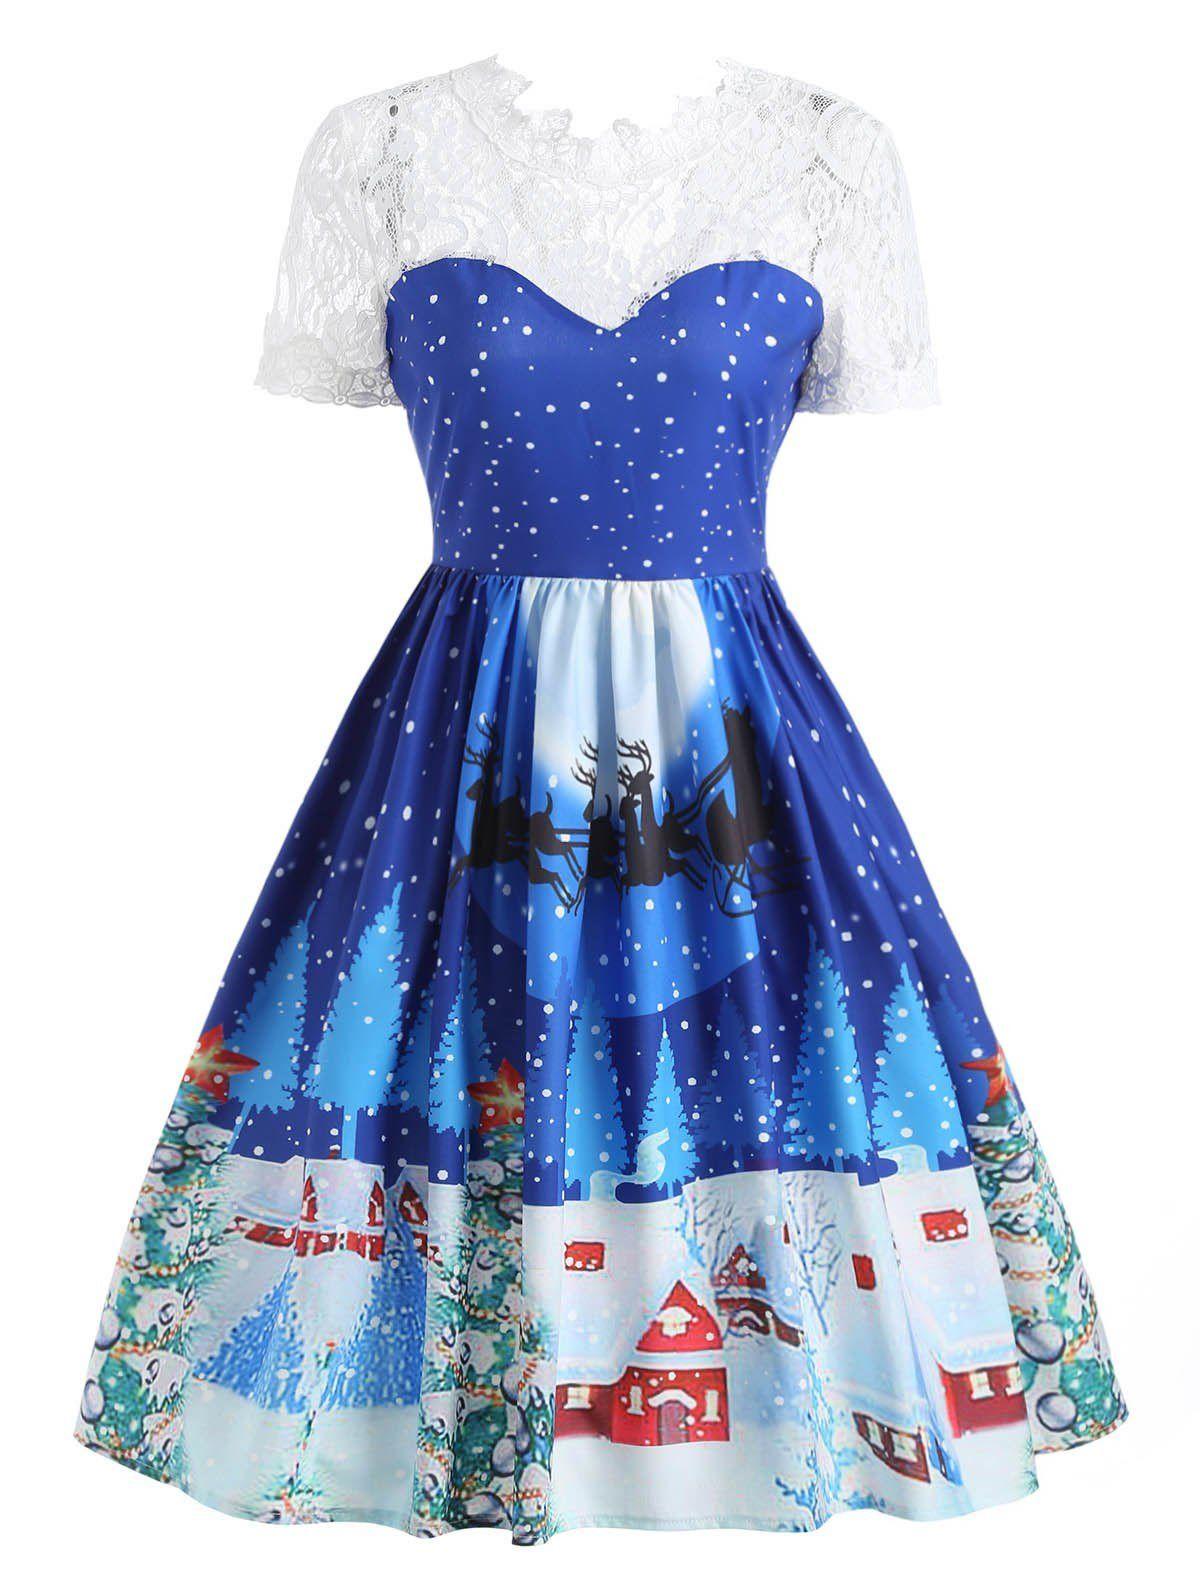 2117ec375ad6c Gamiss Women Autumn Lace Panel Christmas Print 50s Swing Dress Female  Vintage Cute Short Sleeve A Line Dress Rockabilly Vestidos